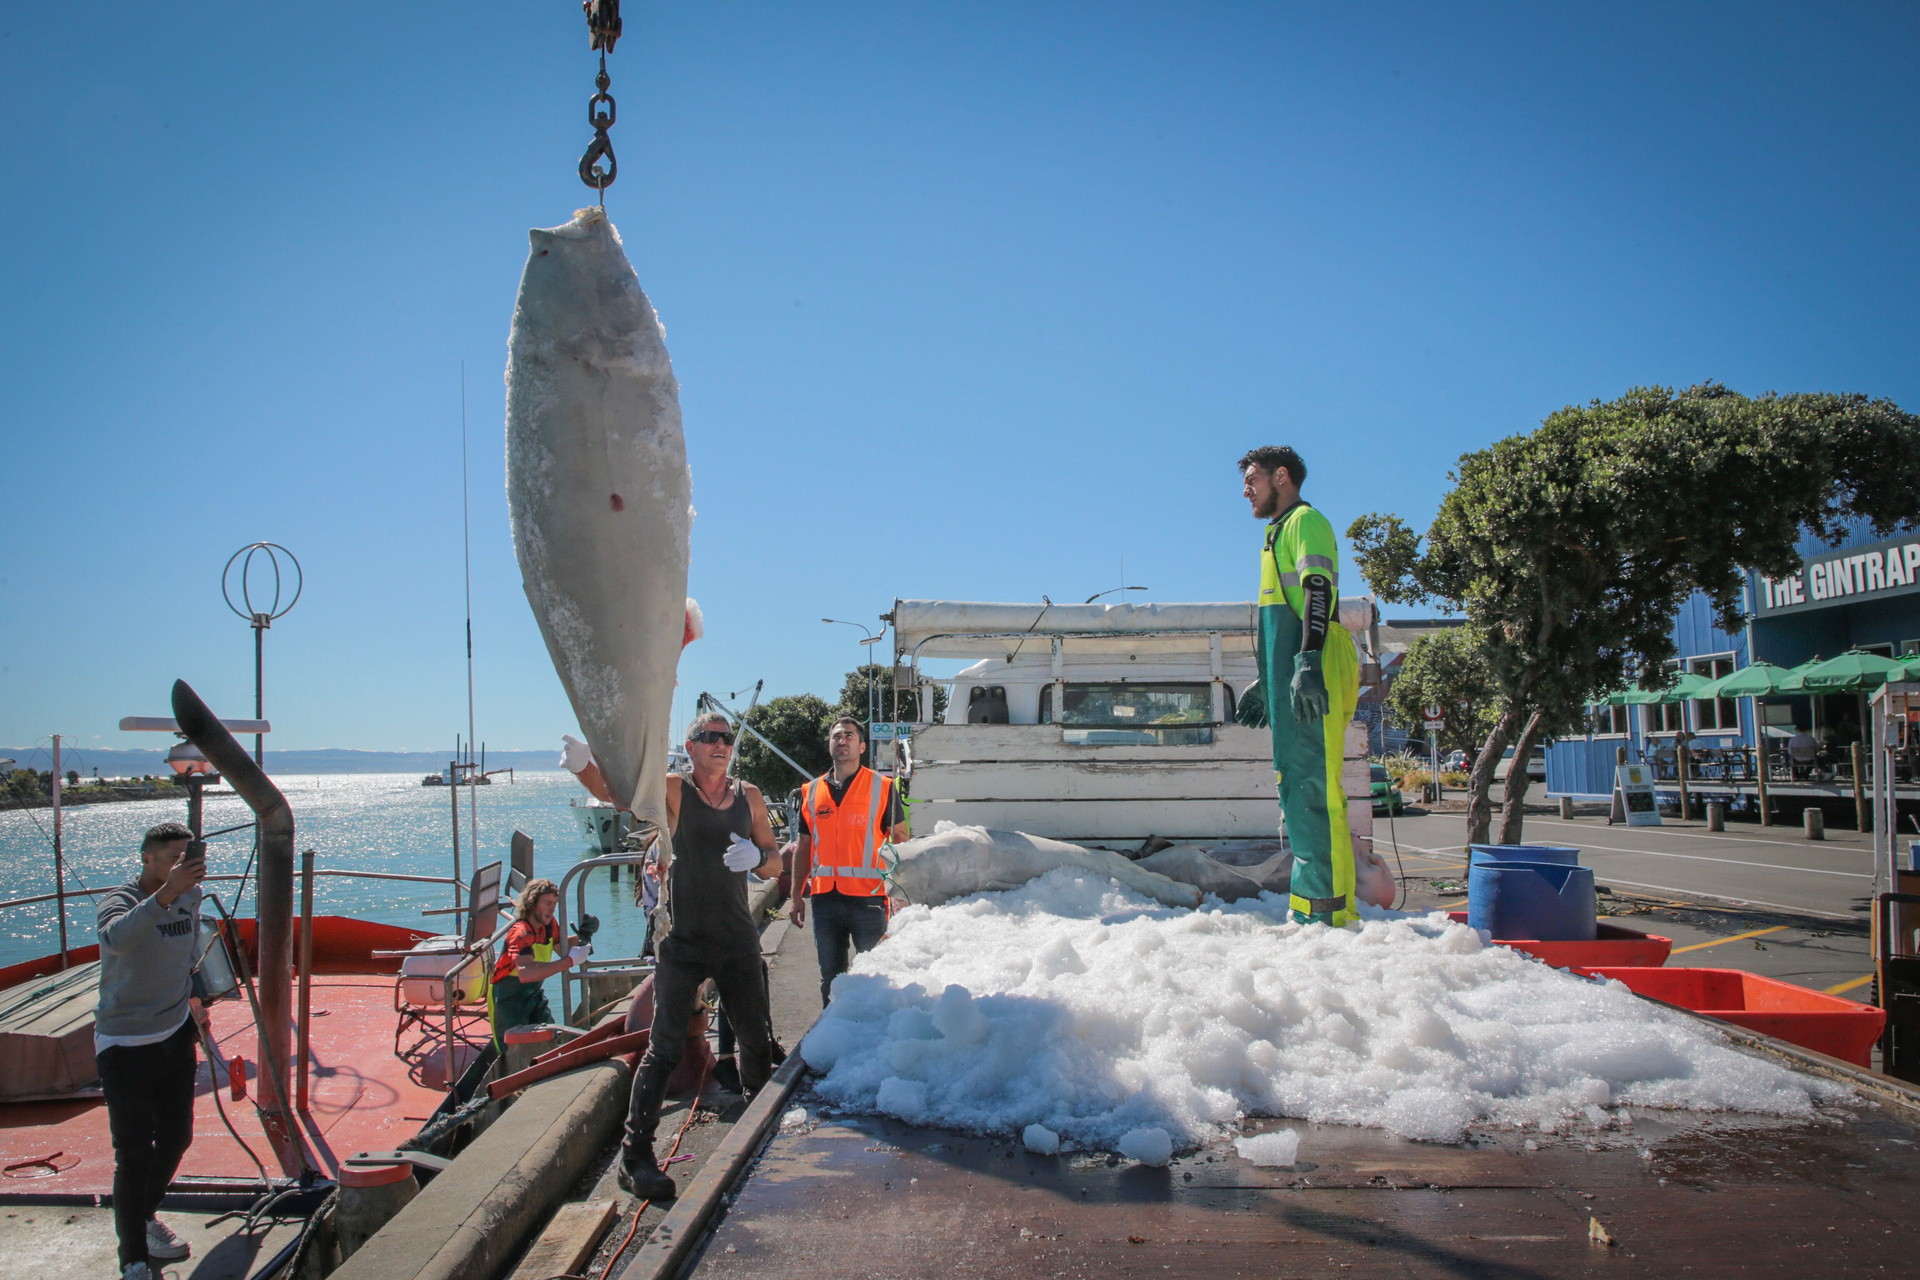 Takitimu Seafoods boat brings in massive 230kg tuna off Hawke's Bay coast